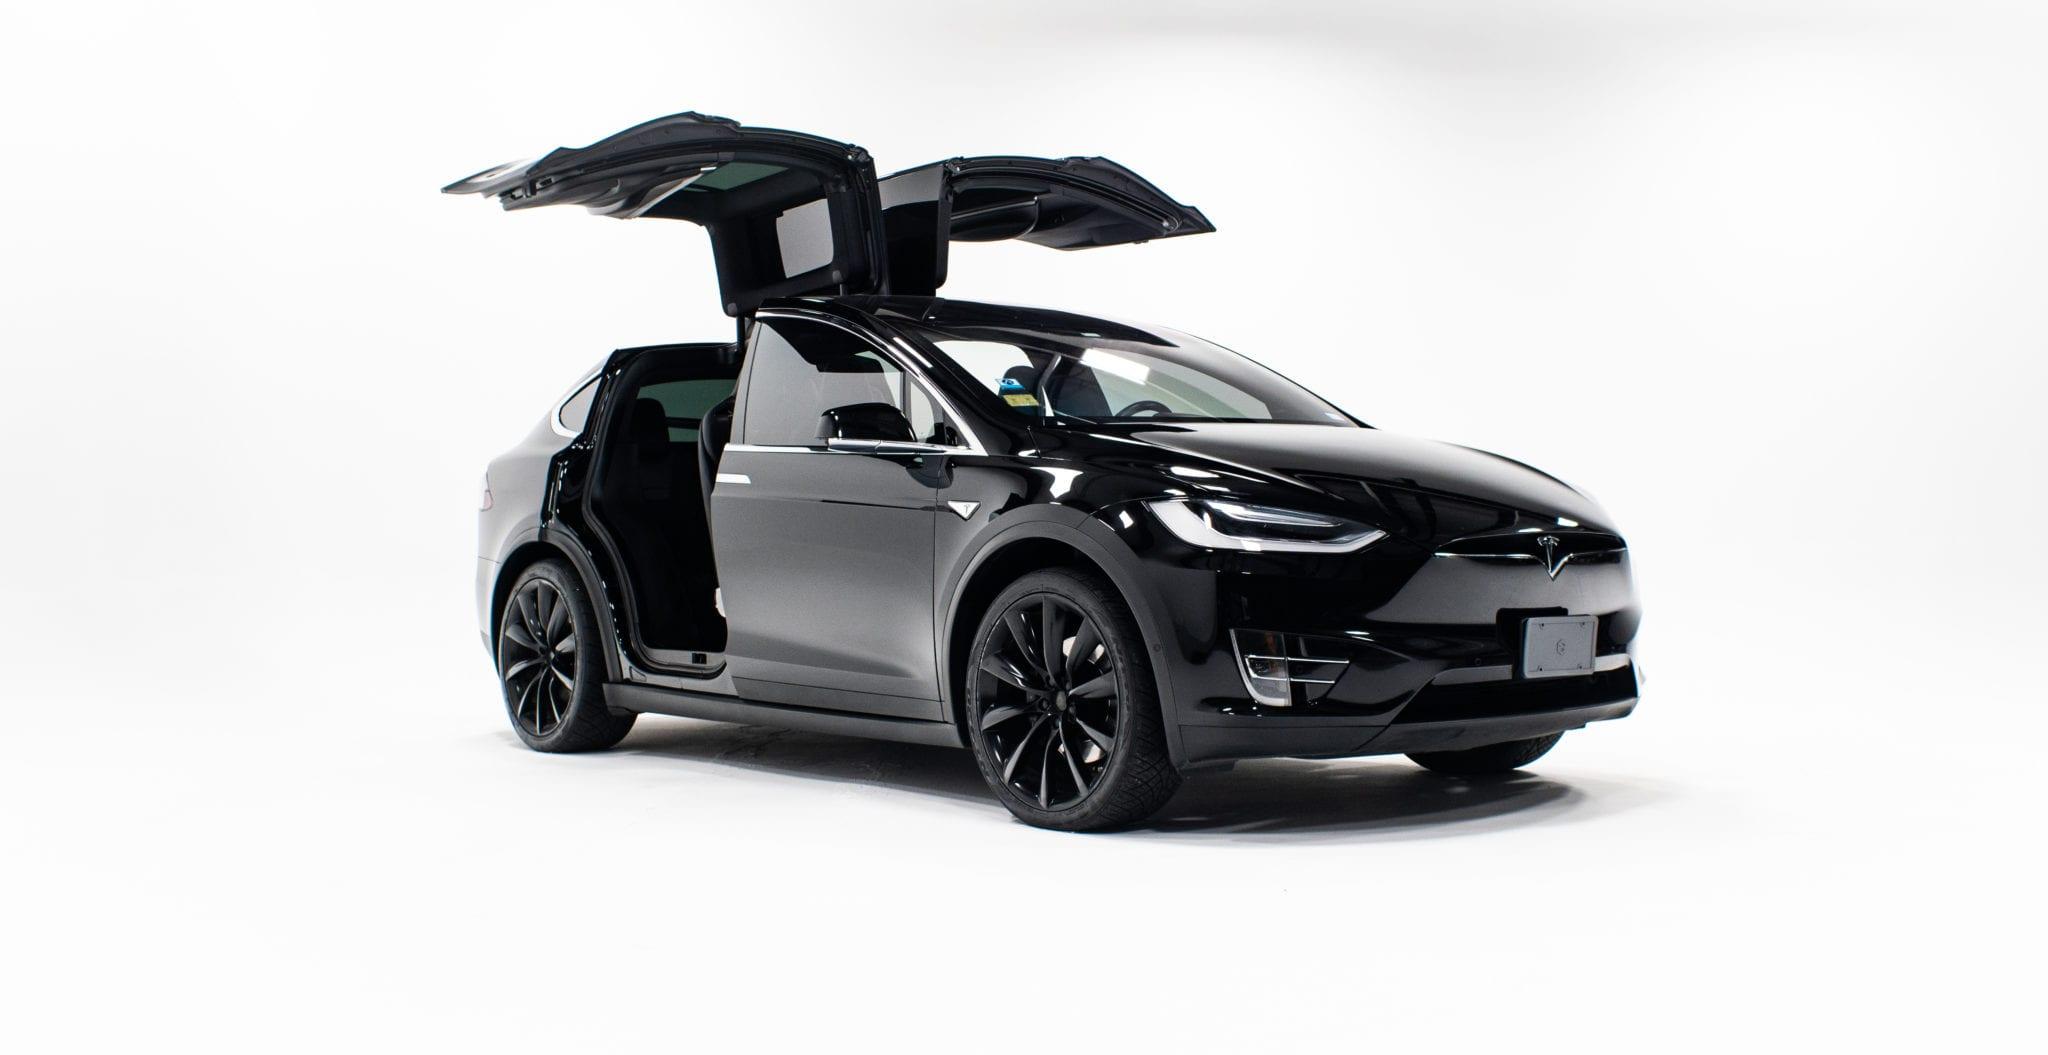 Austin Tesla Model X sunset limo car Services 2